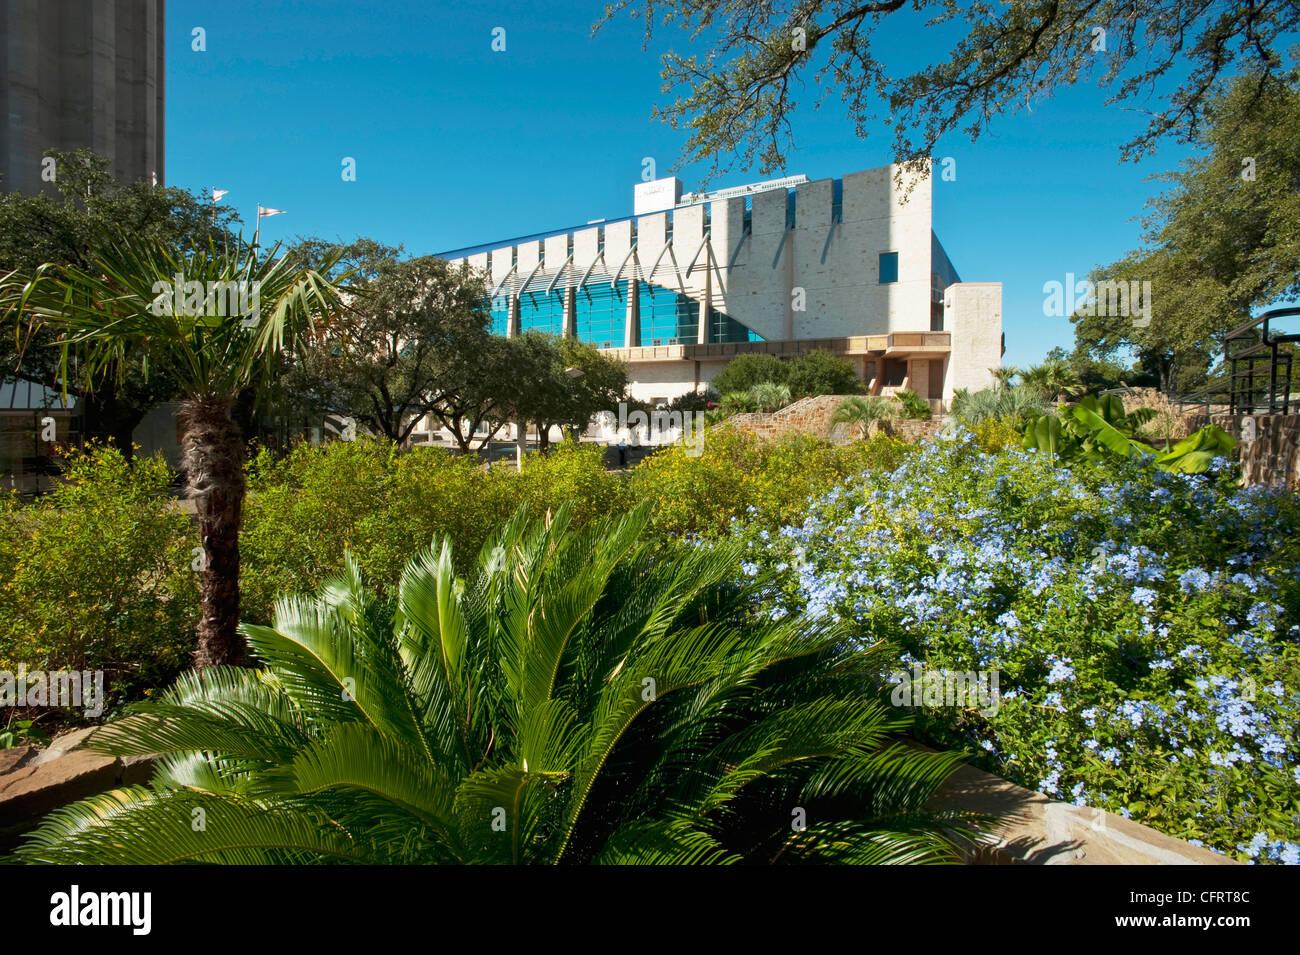 USA, Texas, San Antonio, HemisFair Park, Garden Plants, Flowers Framing  Henry Gonzalez Convention Center.